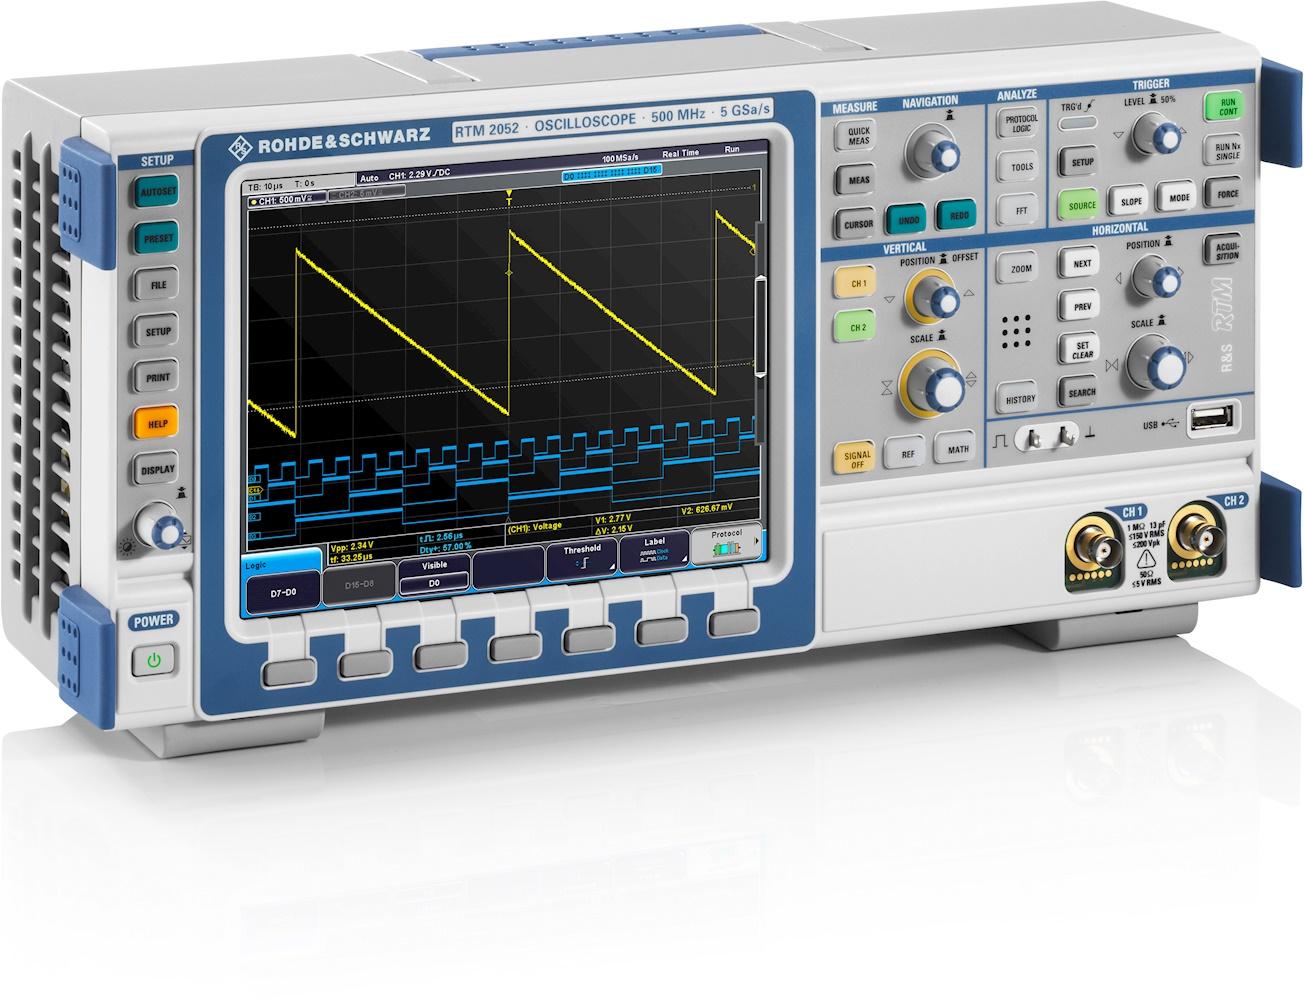 Rohde Amp Schwarz Rtm2102 Oscilloscope Special Offer